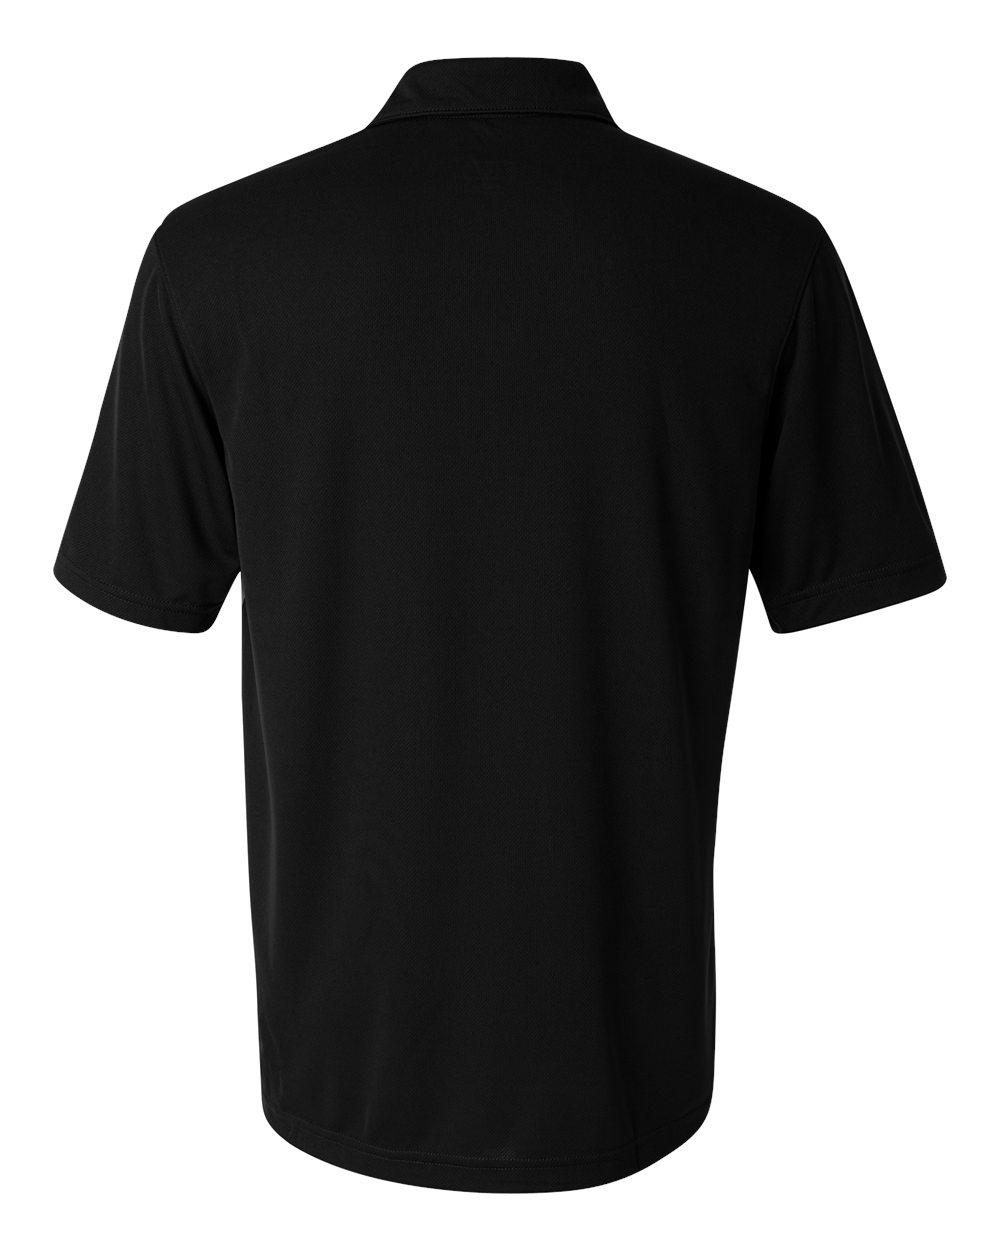 Augusta-Mens-Sportswear-Two-Tone-Premier-Sport-Shirt-5012-up-to-3XL miniature 7